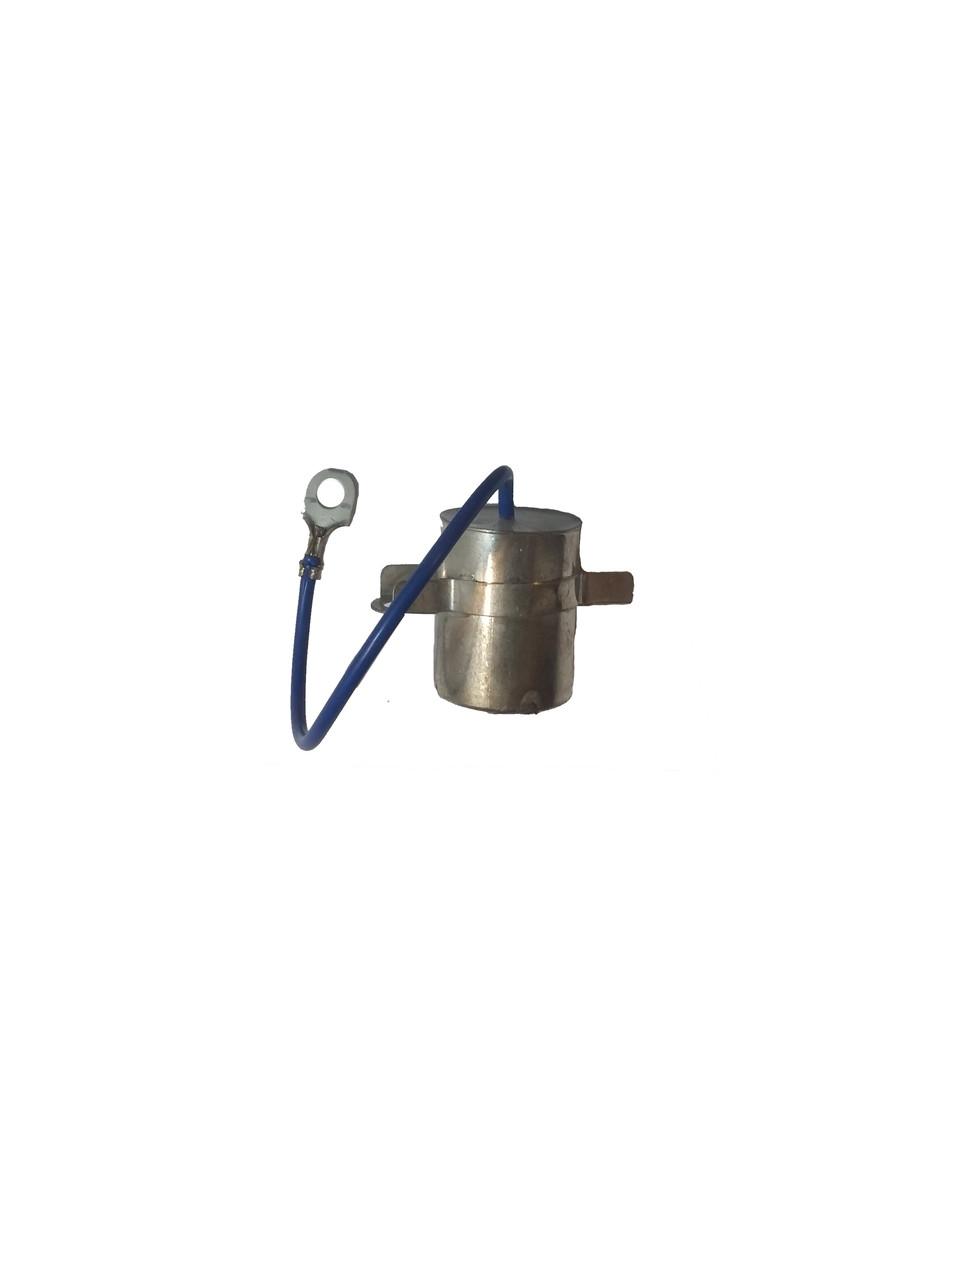 Oil Cooler Seal Kit For Beetle Bus /& Ghia 56-70 Dunebuggy /& VW